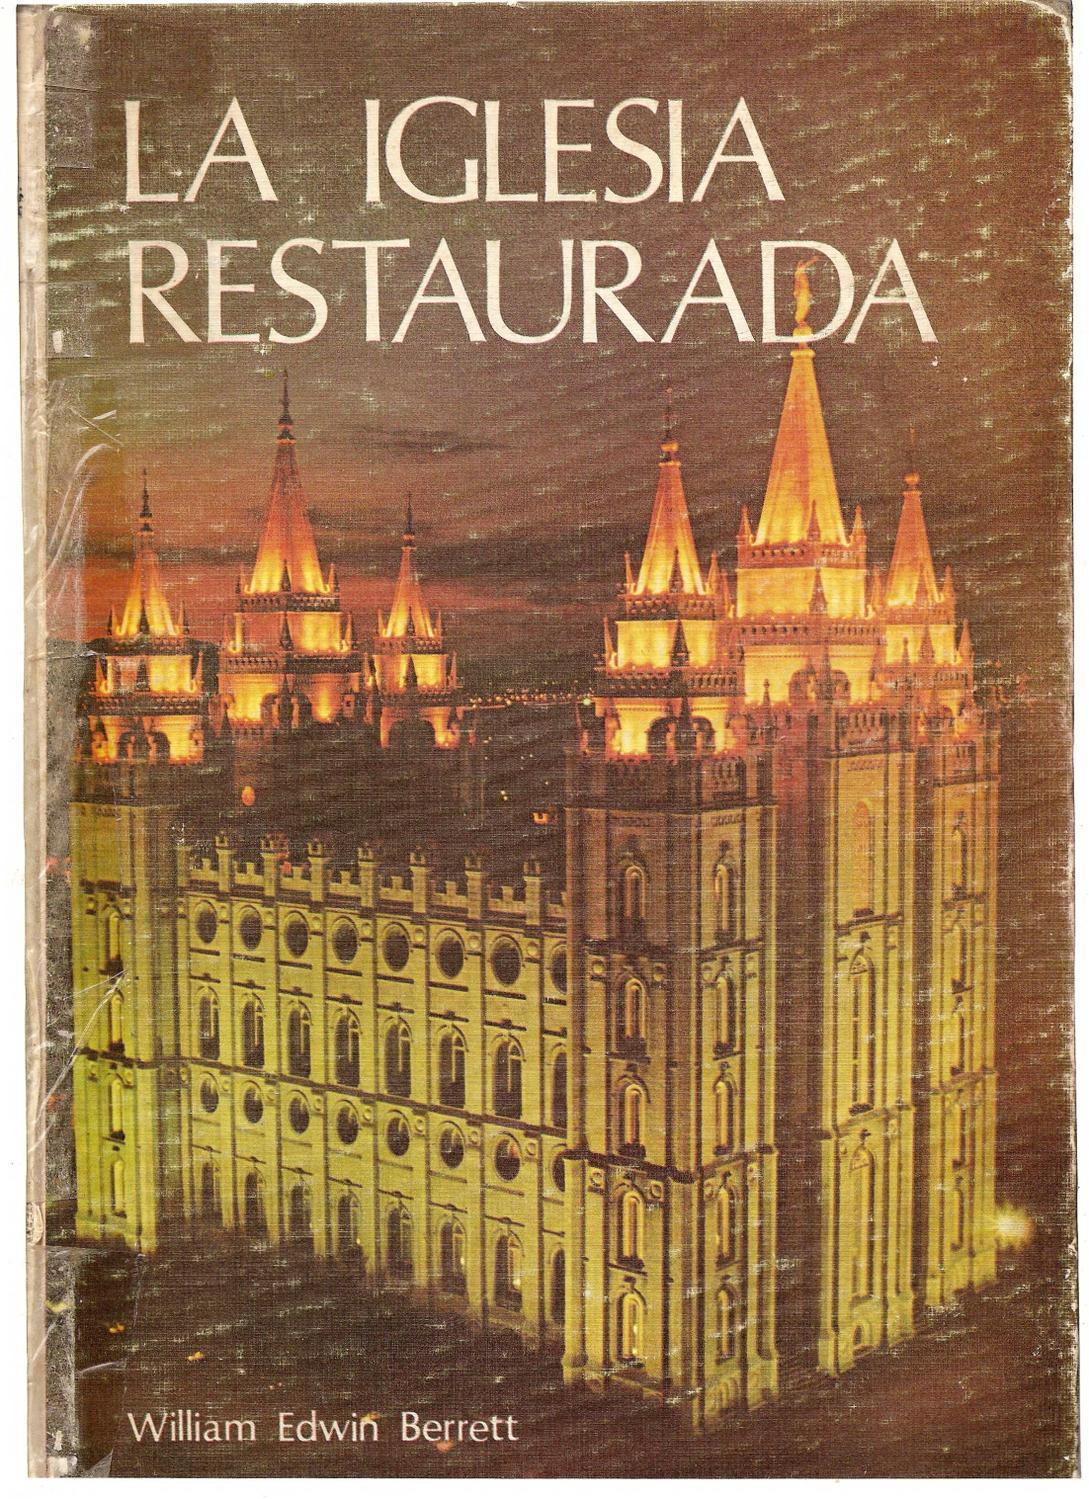 LA IGLESIA RESTAURADA by Ladislao Kangyera - issuu 47ea1090dfc9